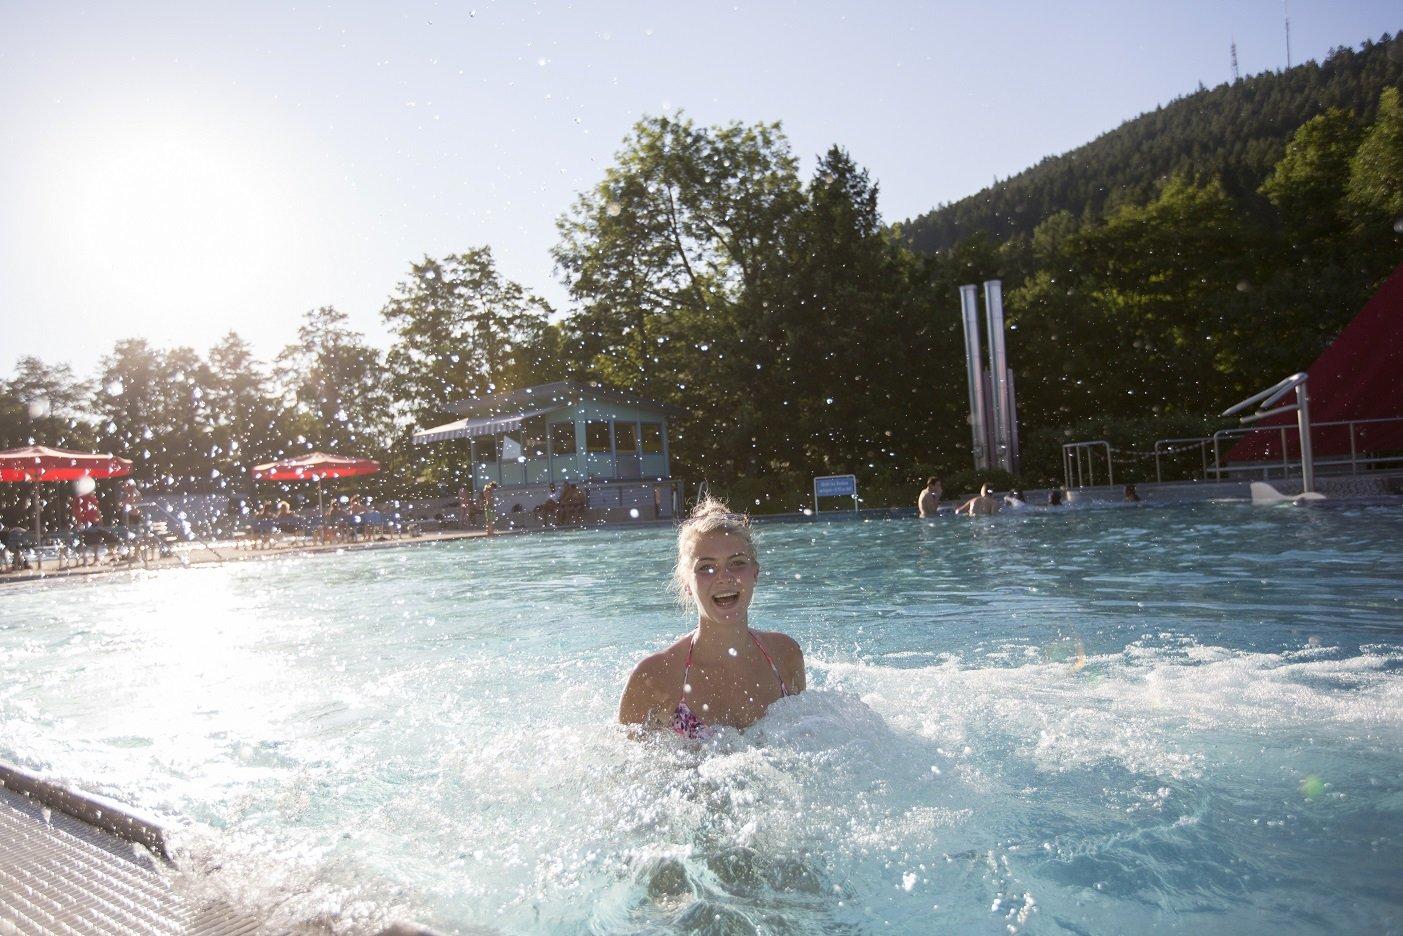 Erlebnisbecken des Freibads Baiersbronn